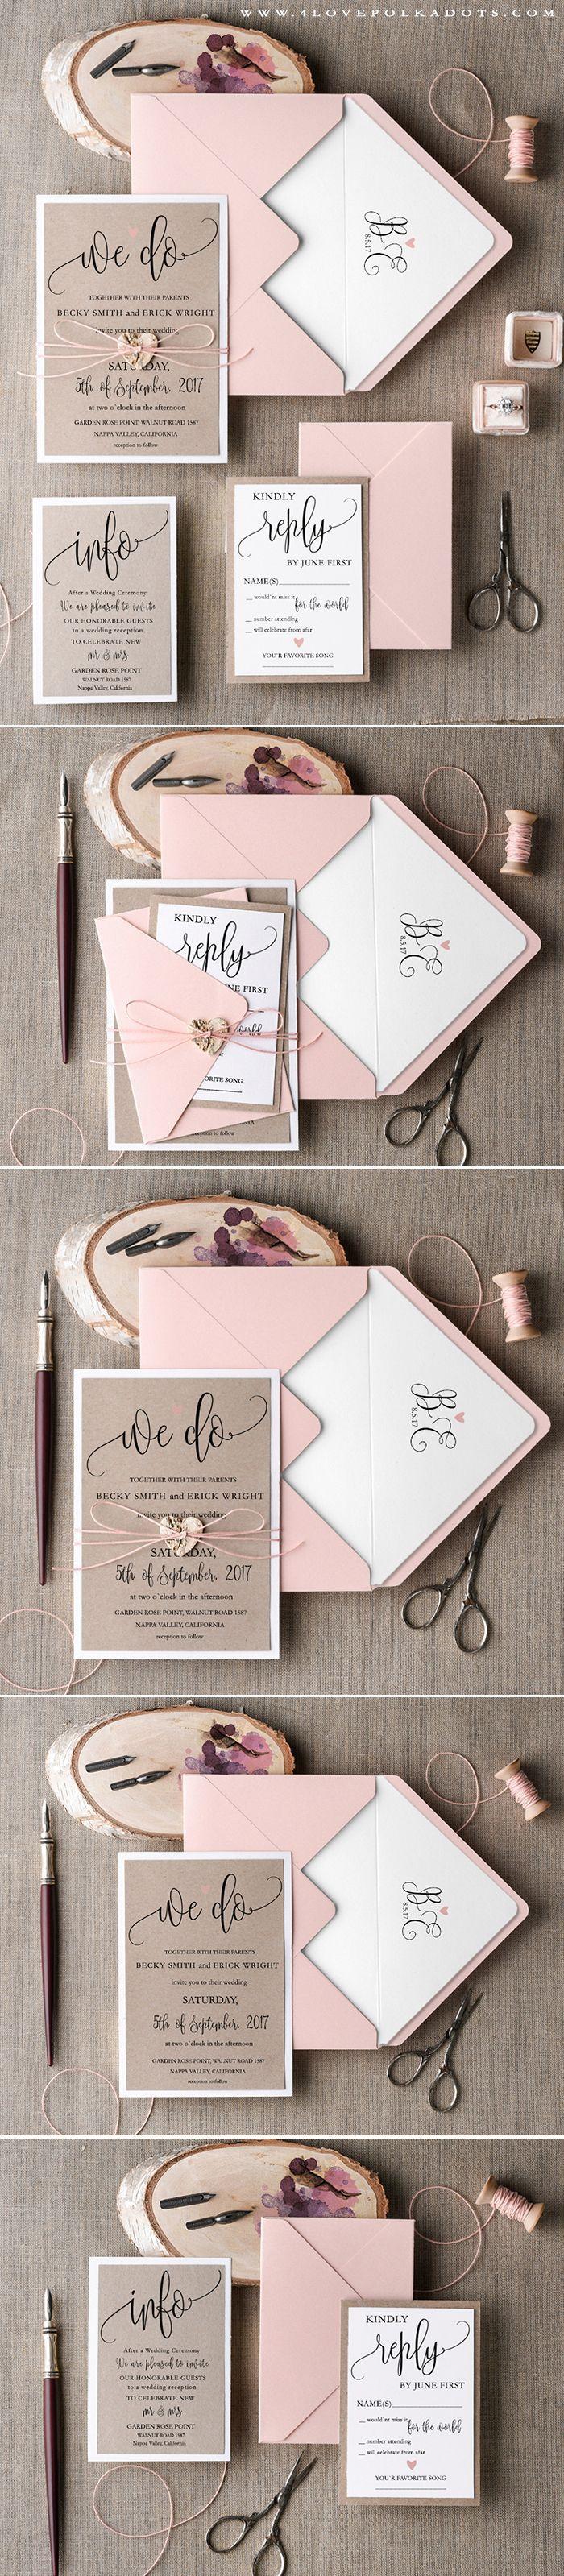 wallpaper diy wedding invitations of computer hd best stationery utah aspen